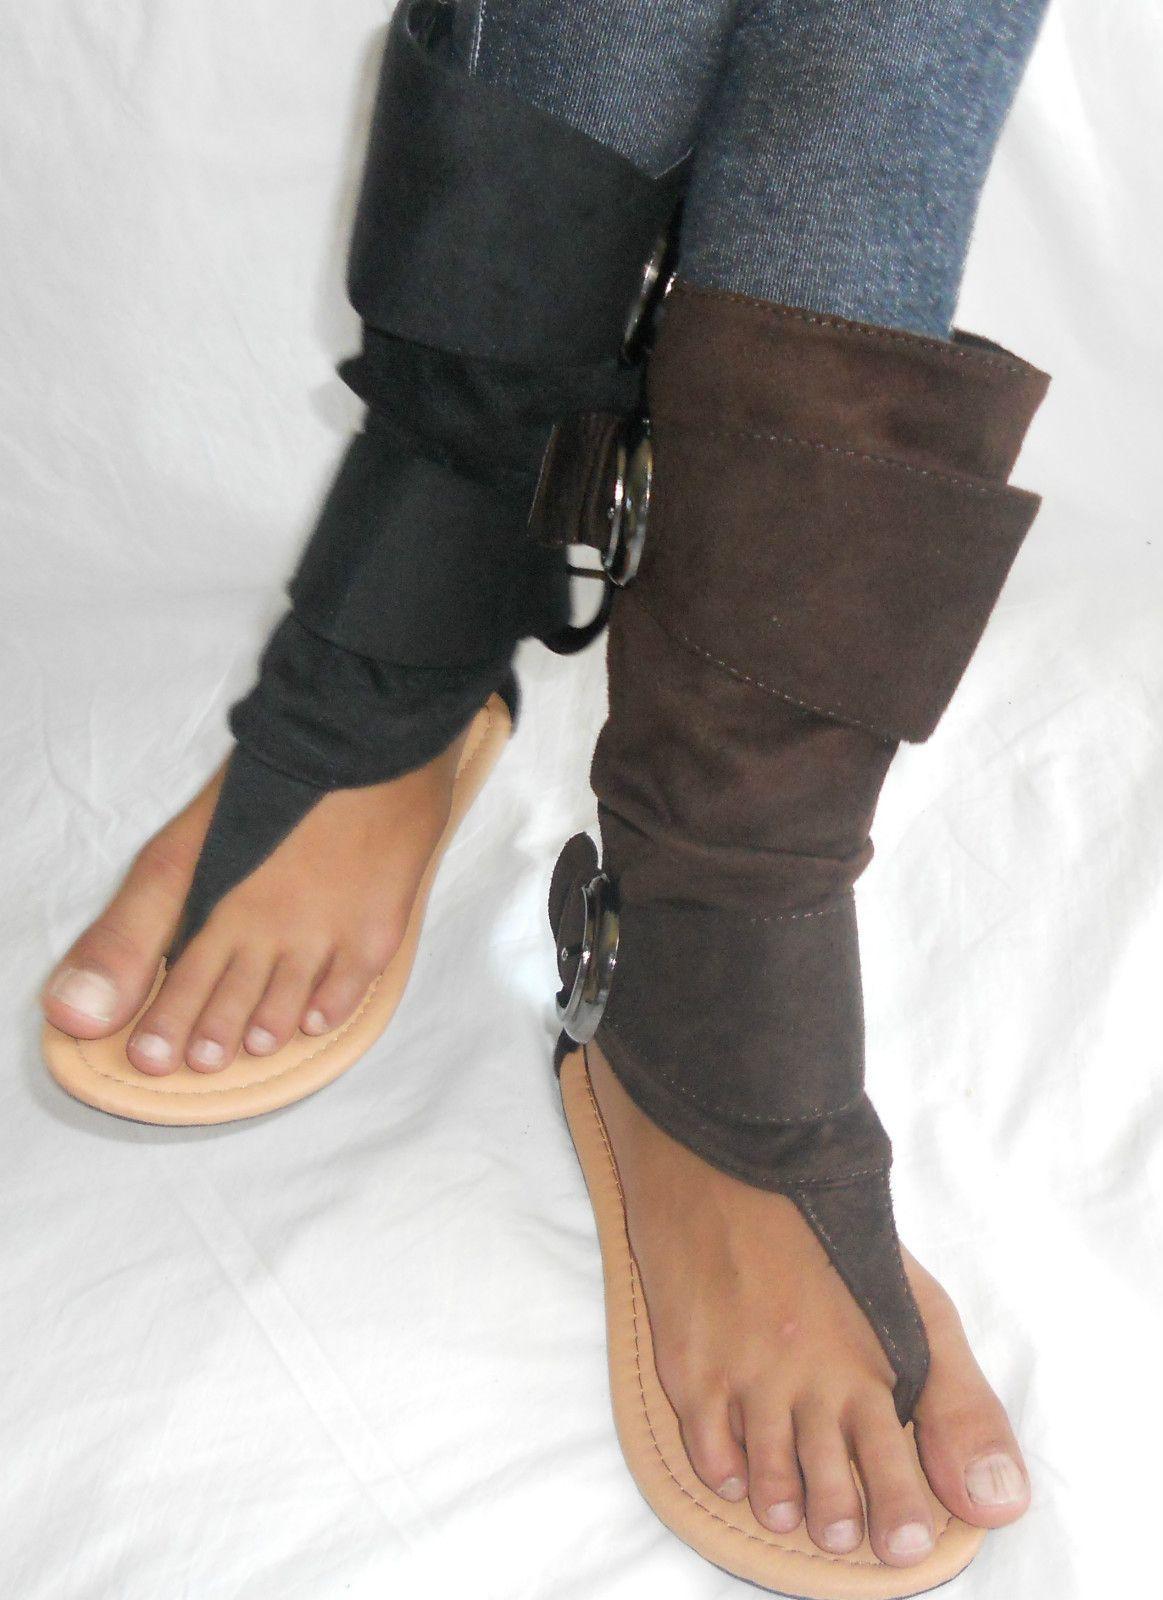 Black boot sandals - Kids Girls High Top Flat Thong Sandal Summer Boot Shoes Black Brown 9 13